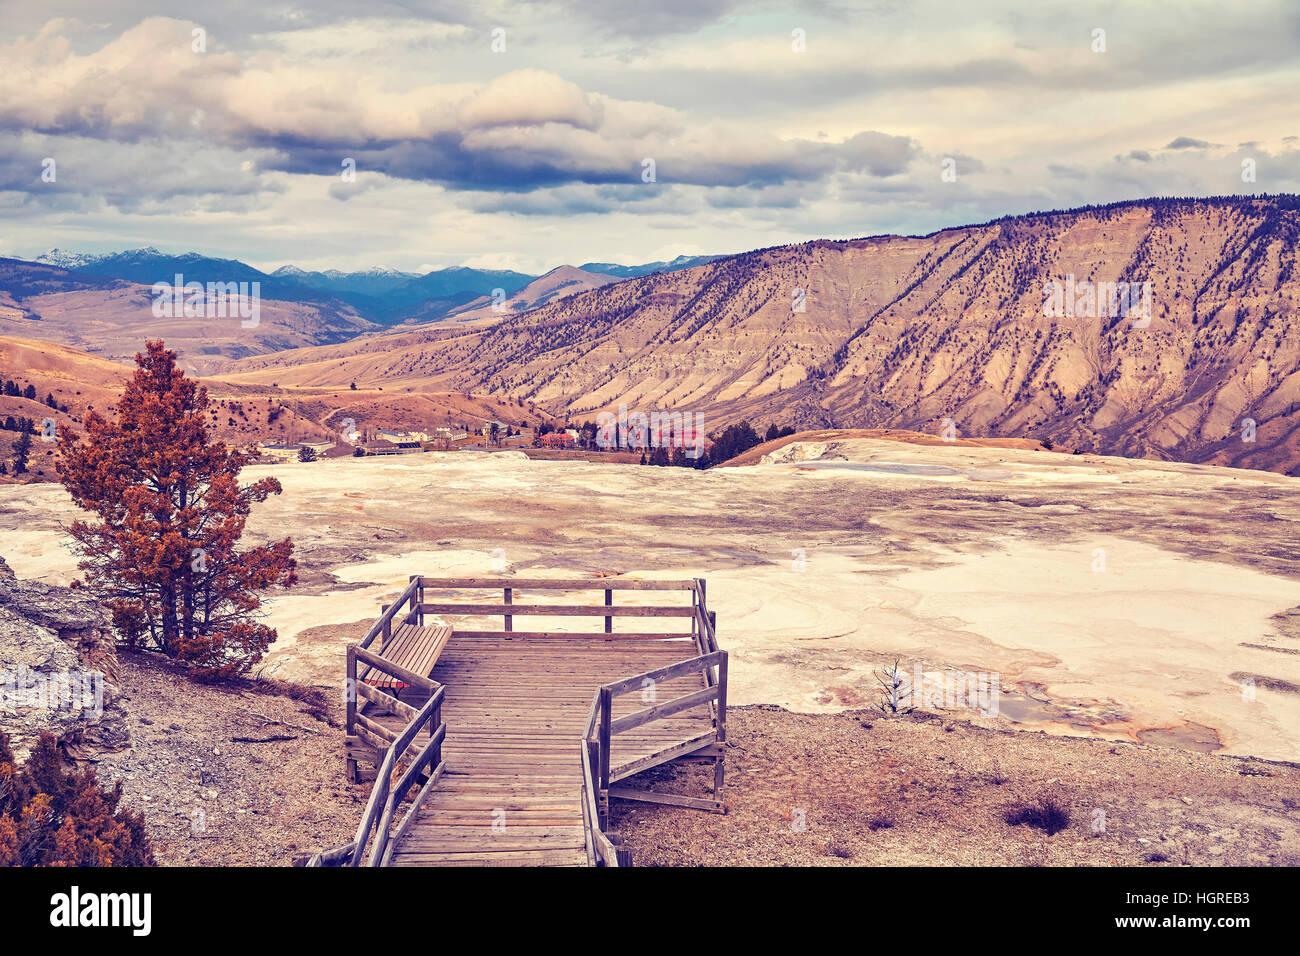 Farbe getönt Hot Springs im Yellowstone-Nationalpark, Wyoming, USA. Stockbild